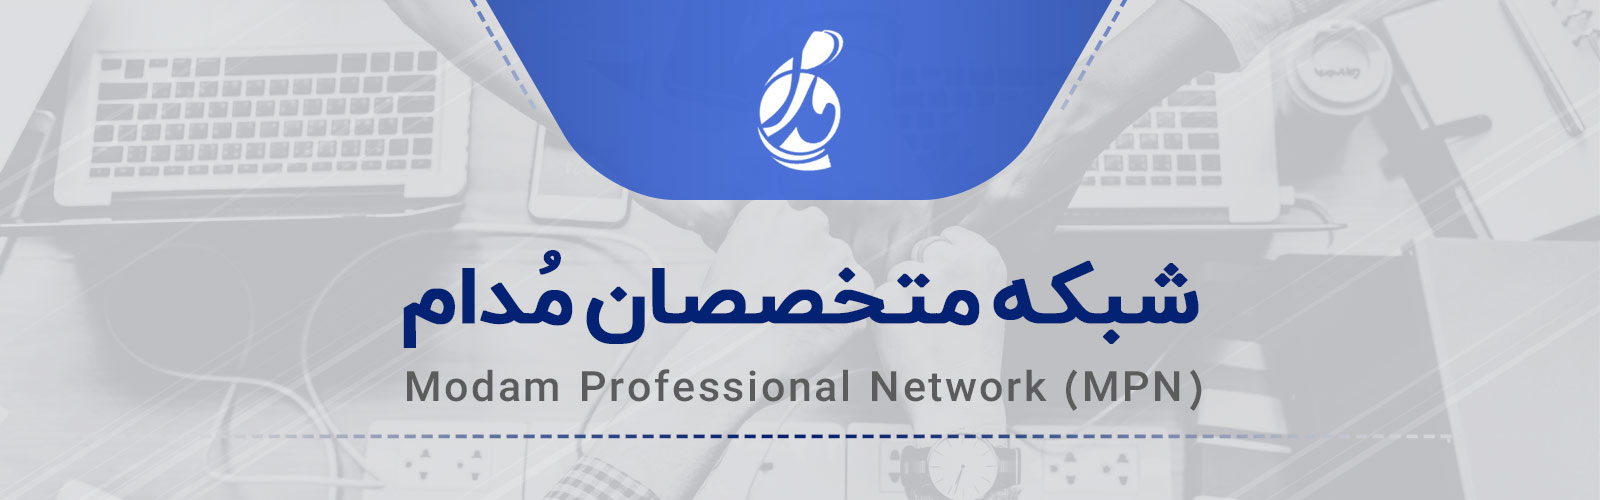 شبکه متخصصان مُدام